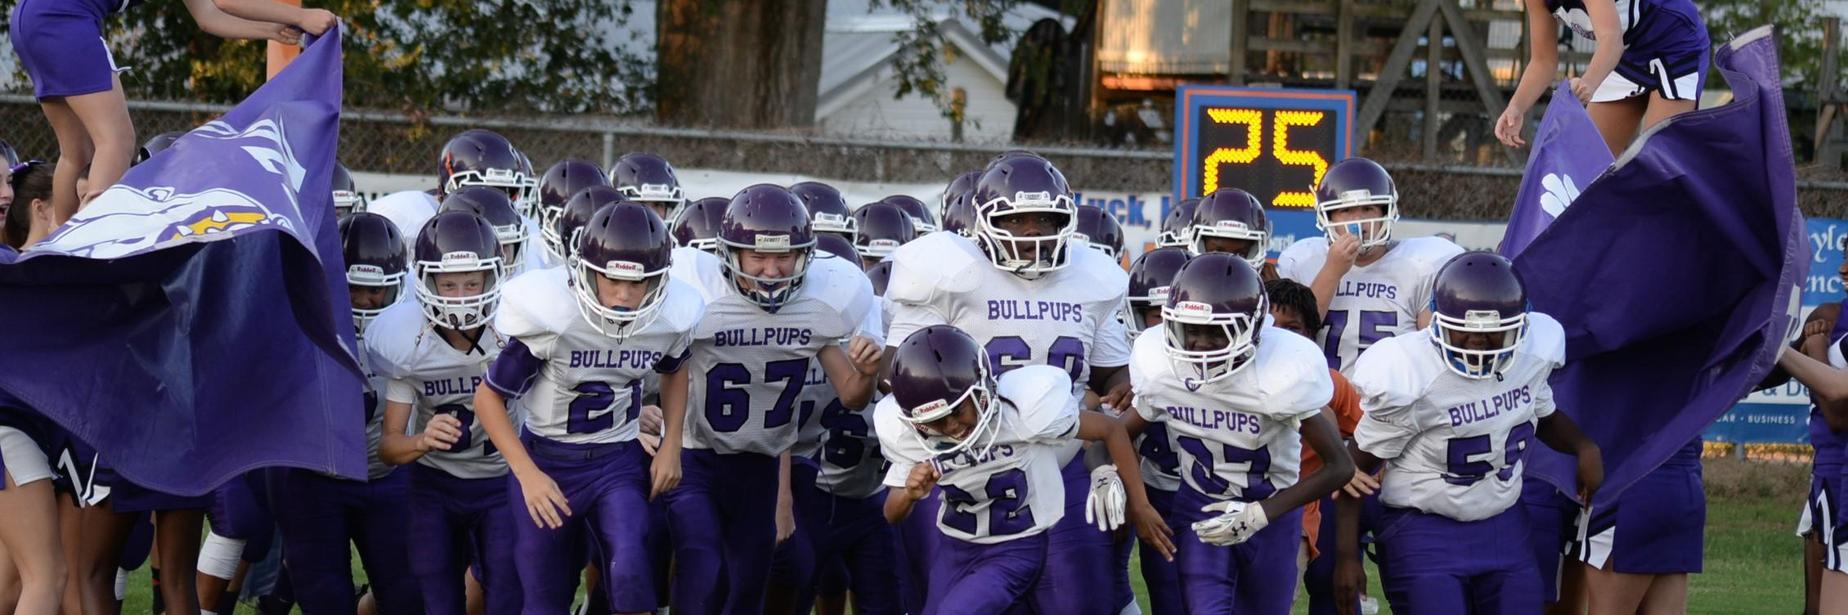 mms football team